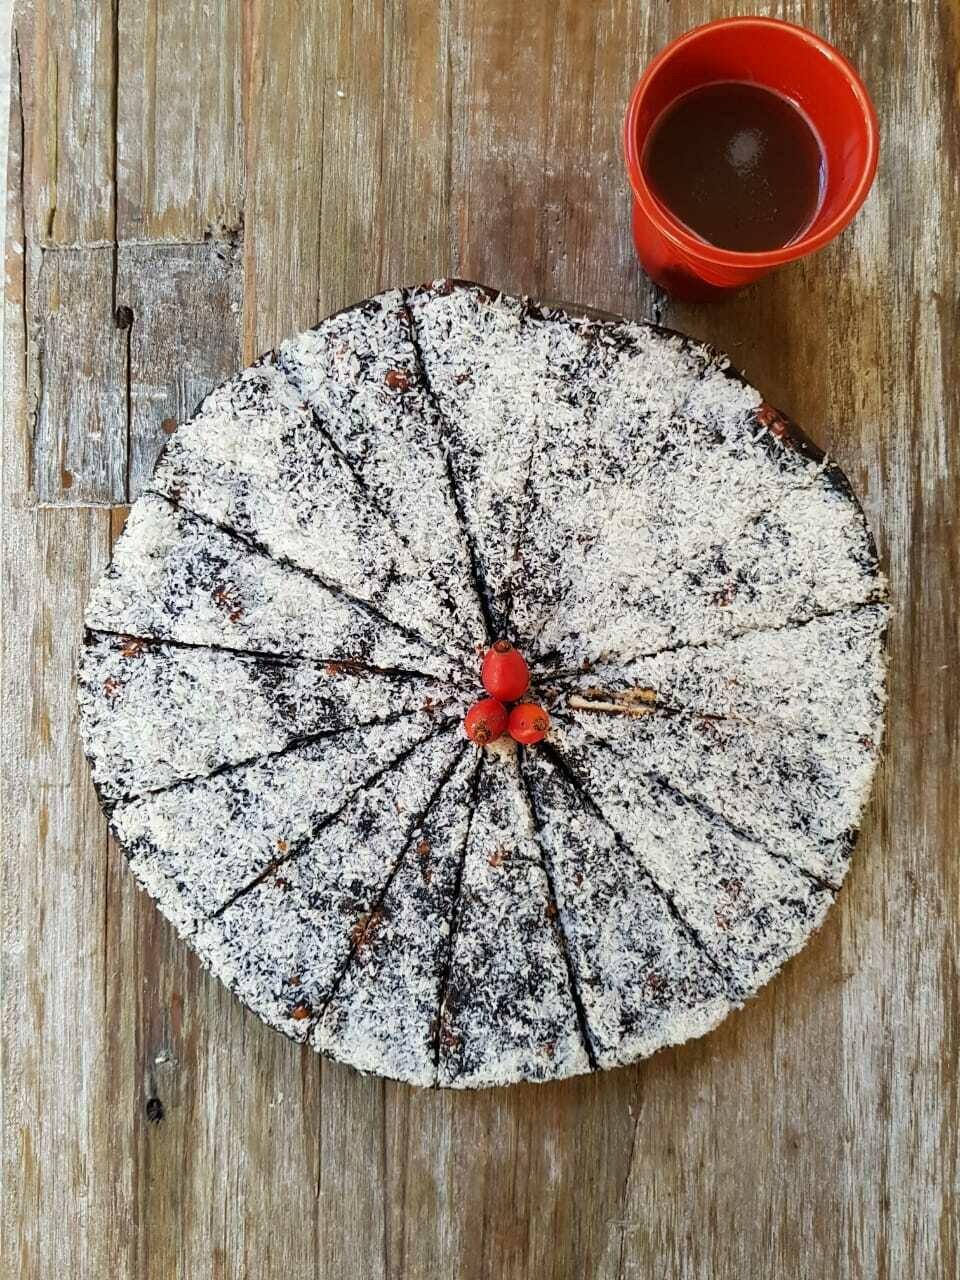 Chocolate Cake Vegan كيك الشوكولاتة نباتي (Piece) - Crafting Delices